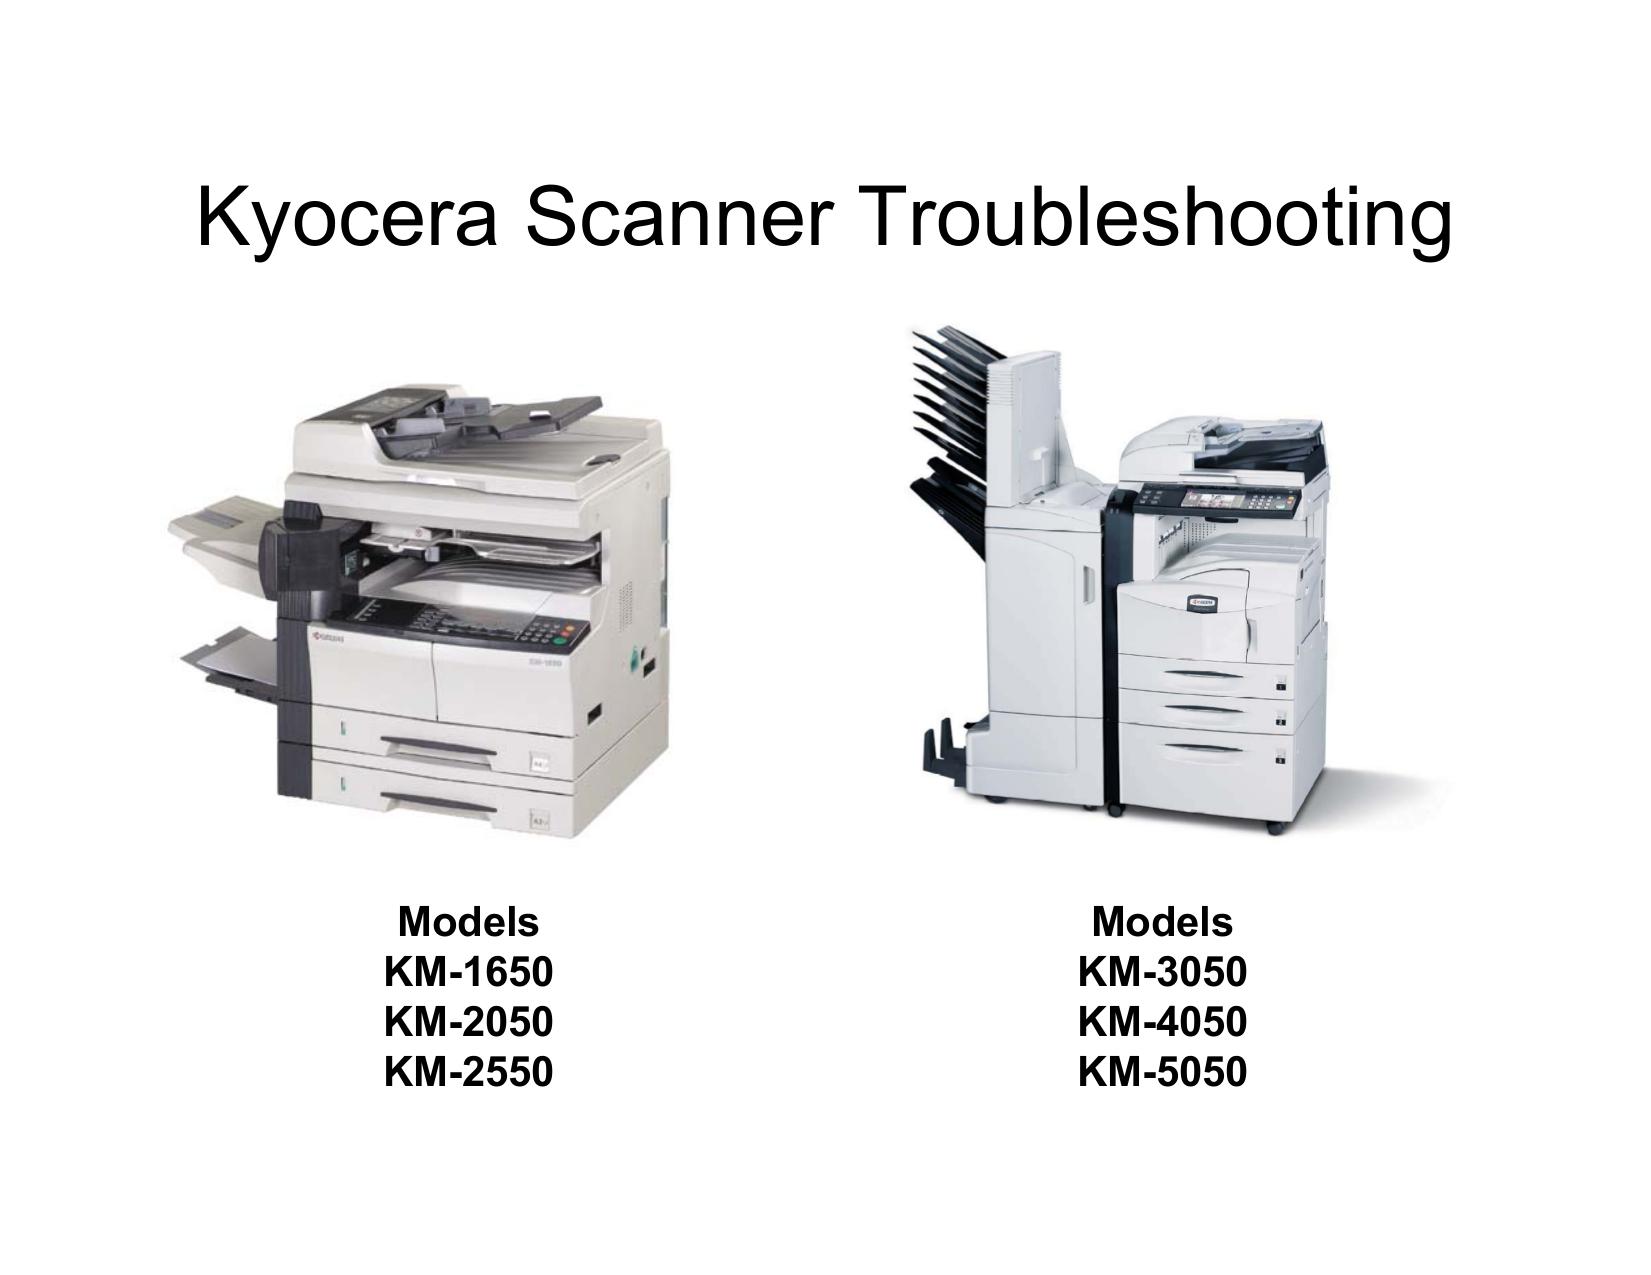 Download free pdf for Kyocera KM-5050 Scanner manual